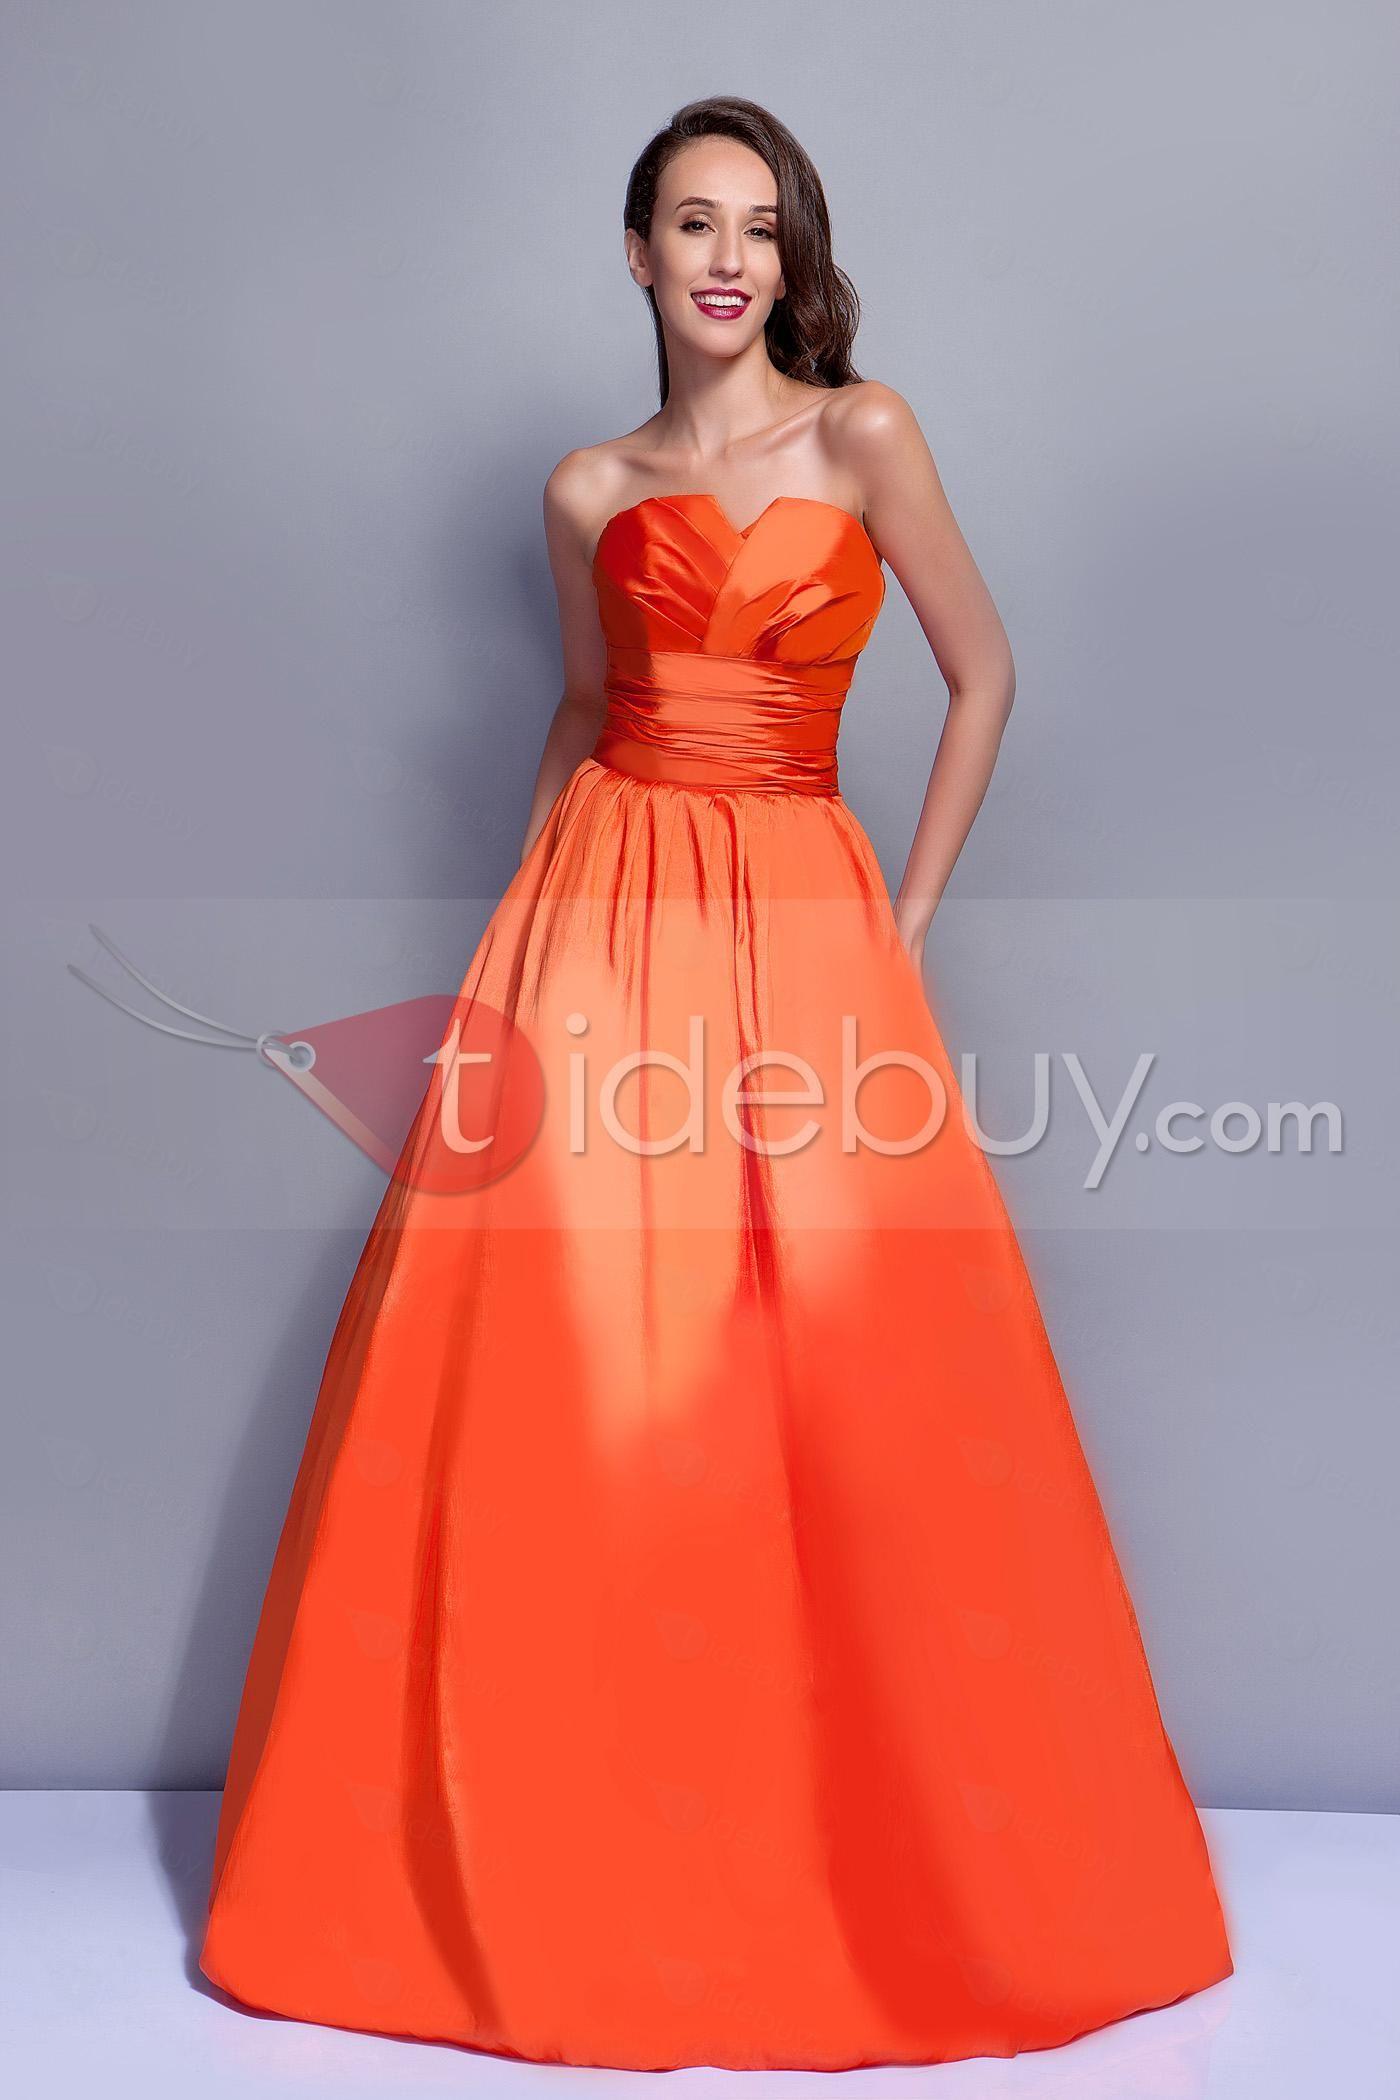 Prom dresses fashion pinterest prom